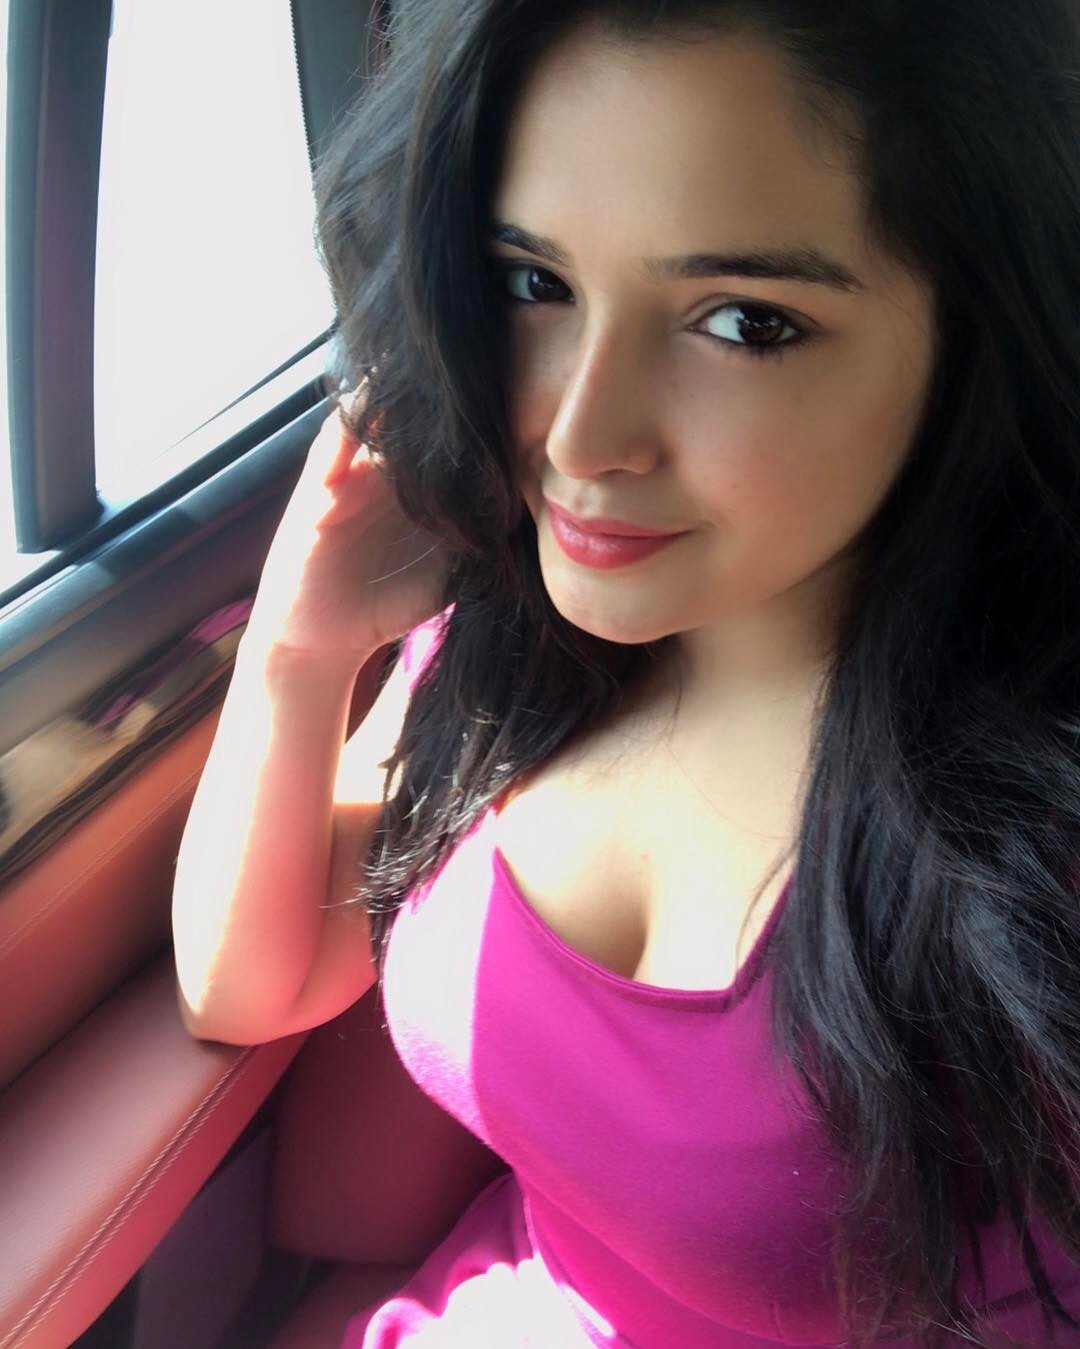 Amrapali Dubey Cleavage Photos Hot - Actress World-7491